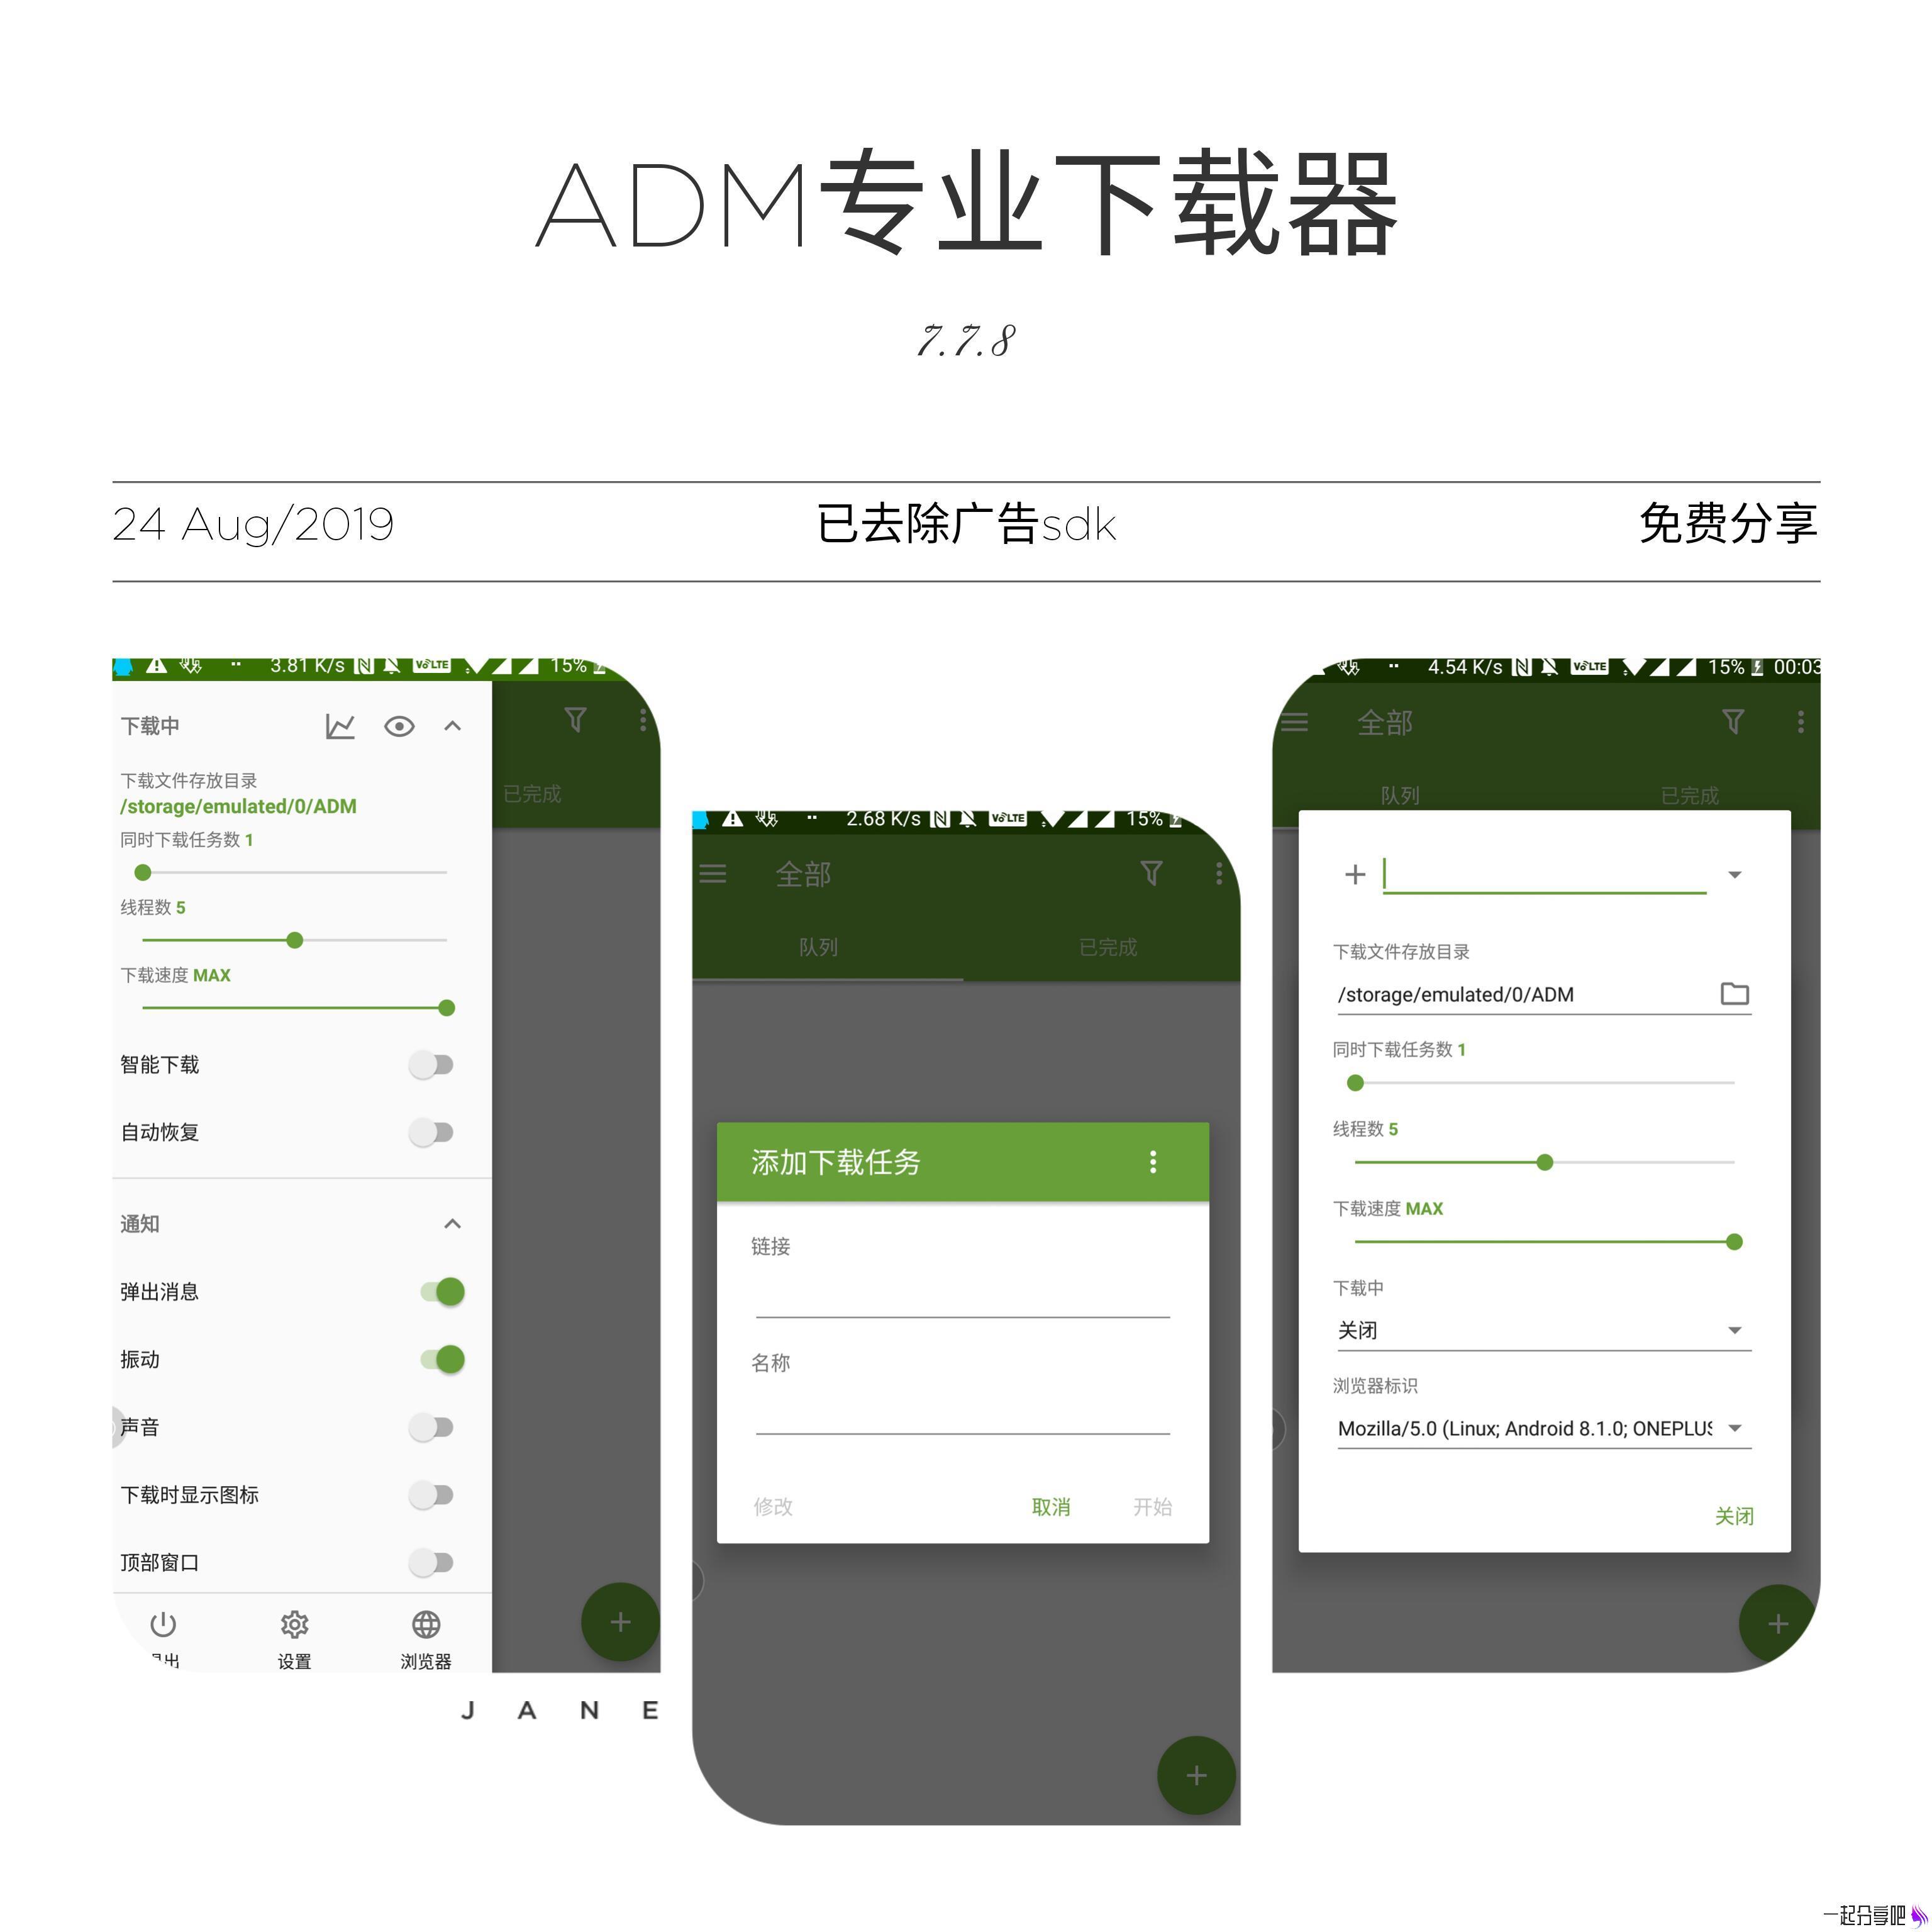 ADM下载器Pro专业版 一款多线程下载工具 第1张